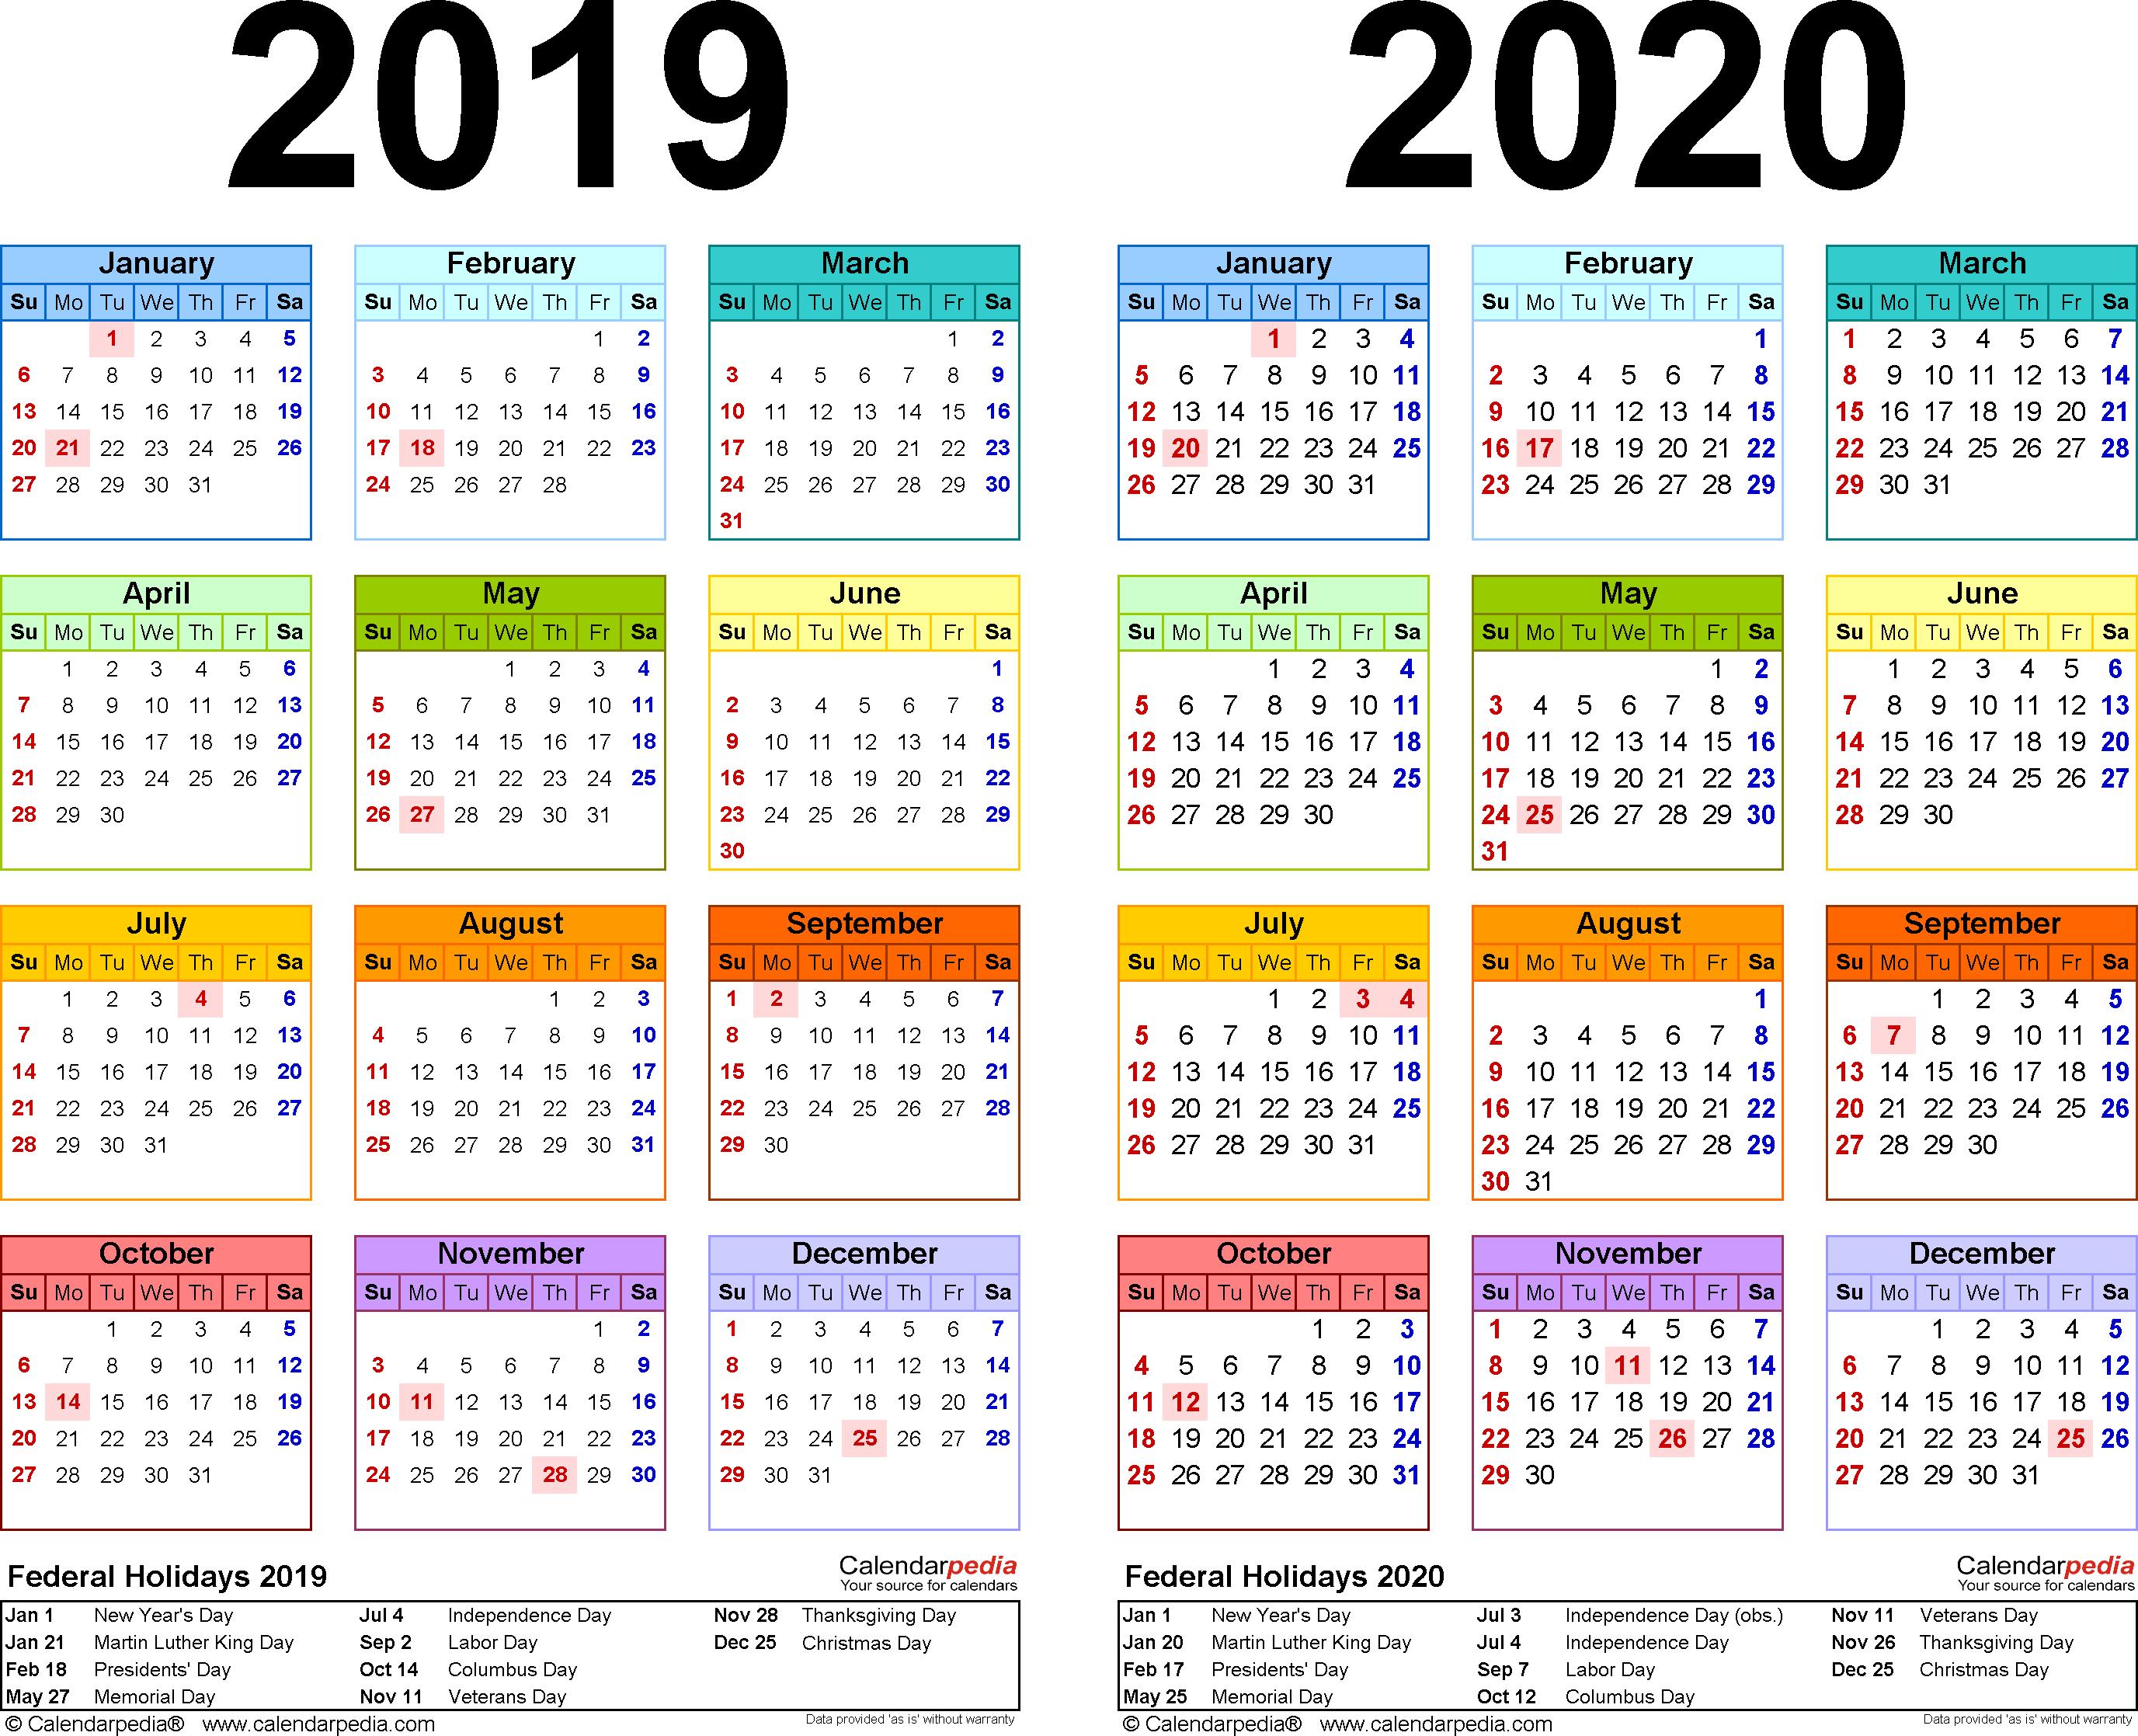 2019-2020 Calendar - Free Printable Two-Year Pdf Calendars throughout Pocket Printable 2019-2020 Calendar Free